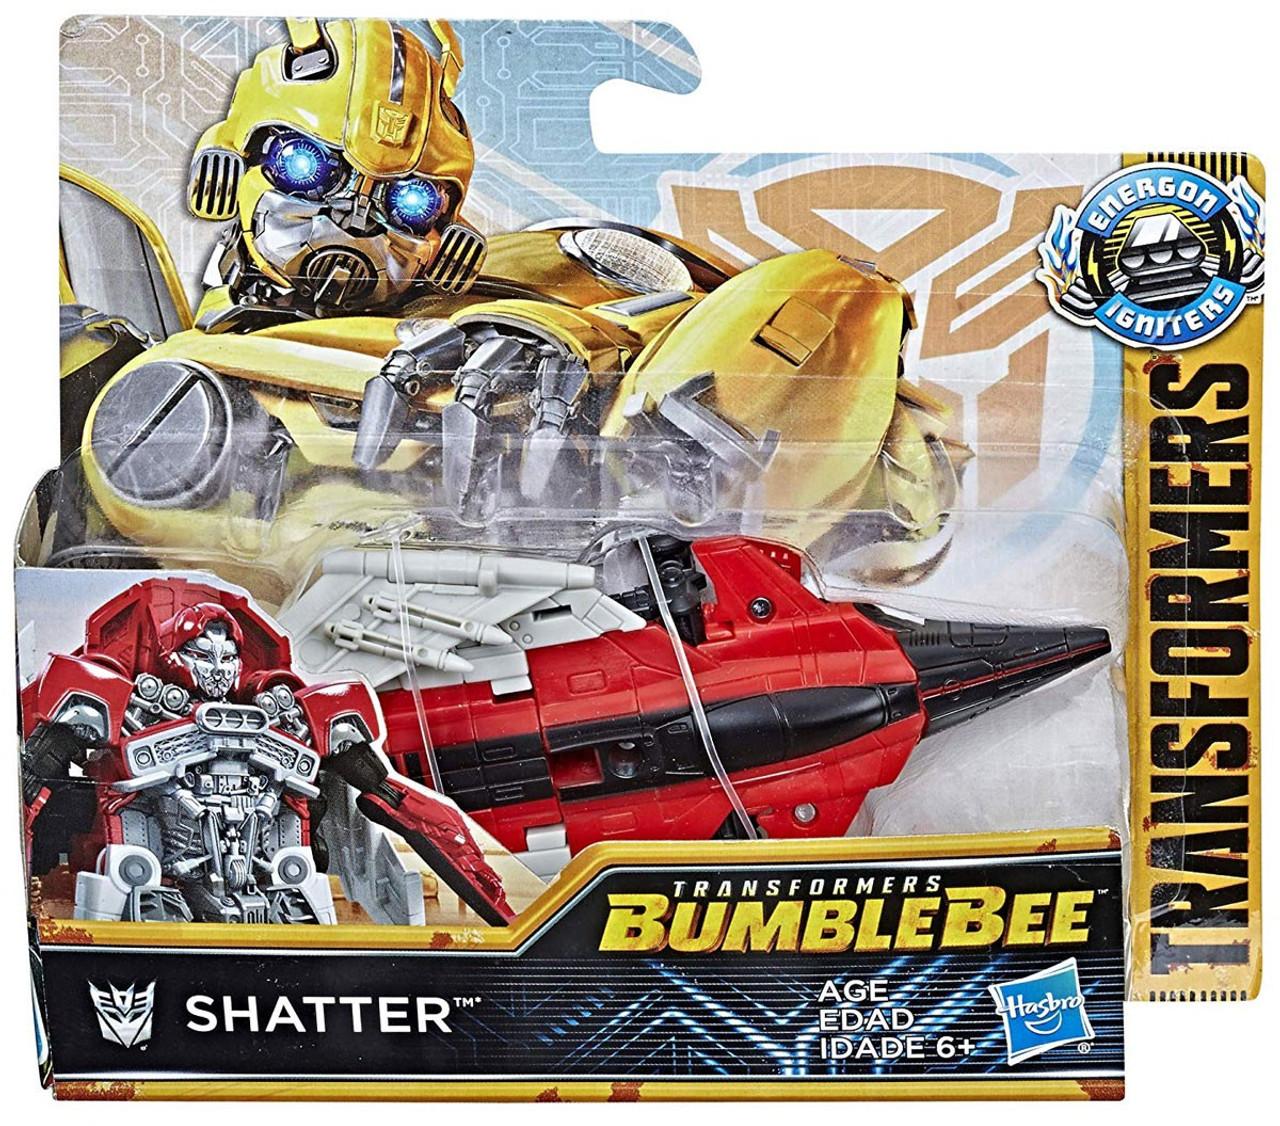 Shatter Bumblebee Transformers Movie Actionfigur Hasbro